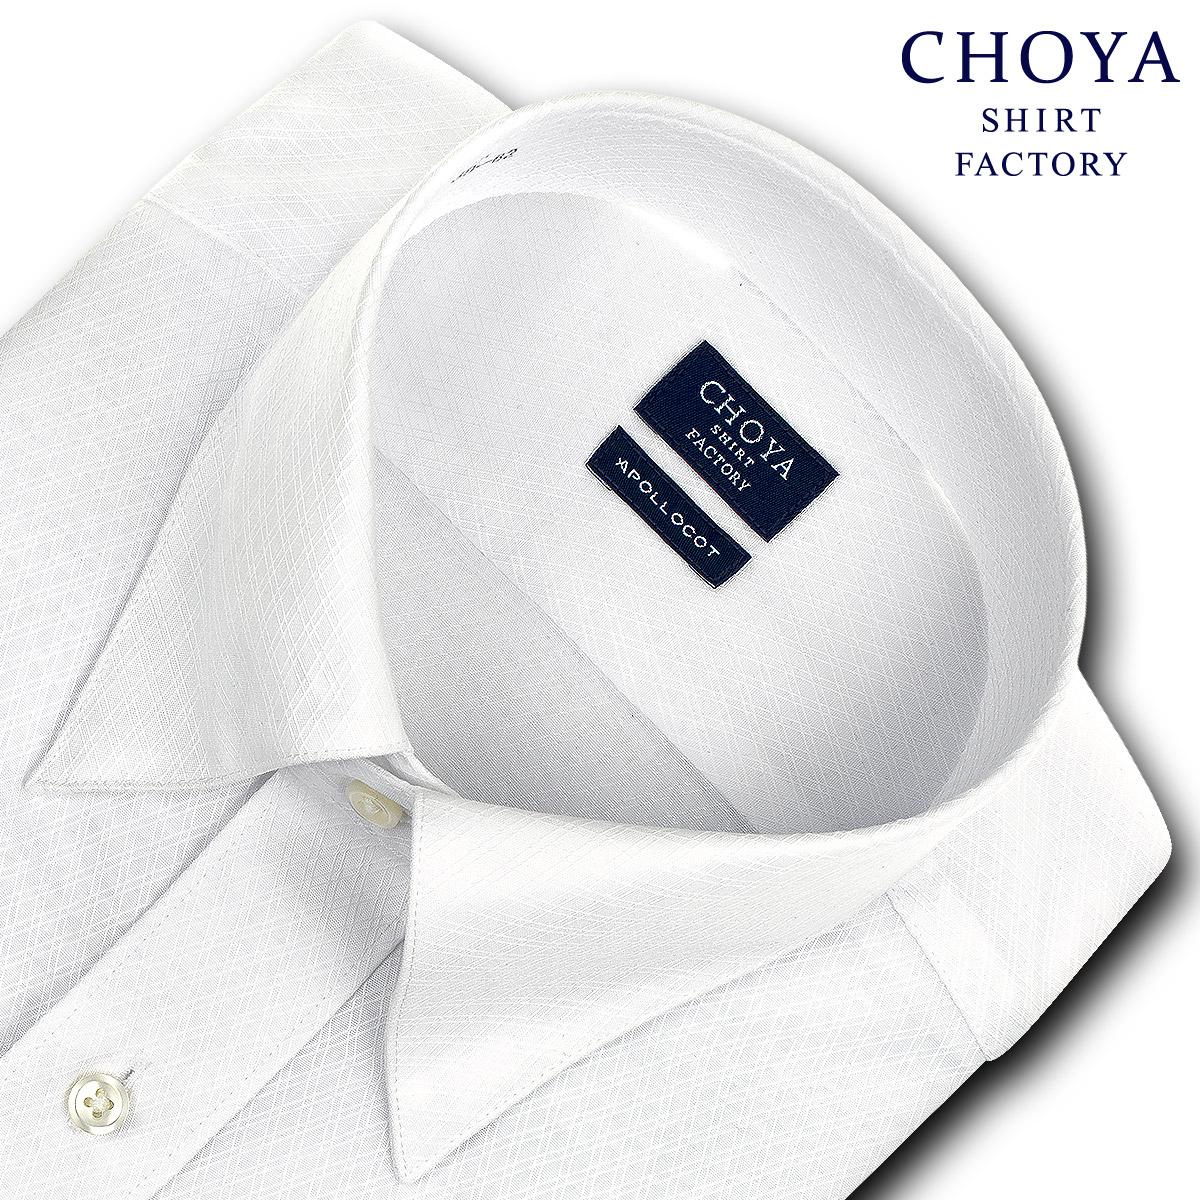 CHOYA SHIRT FACTORY 日清紡アポロコット 長袖 ワイシャツ メンズ 春夏秋冬 形態安定加工 白ドビーバイアスチェック スナップダウンシャツ 綿:100% ホワイト(cfd932-200)